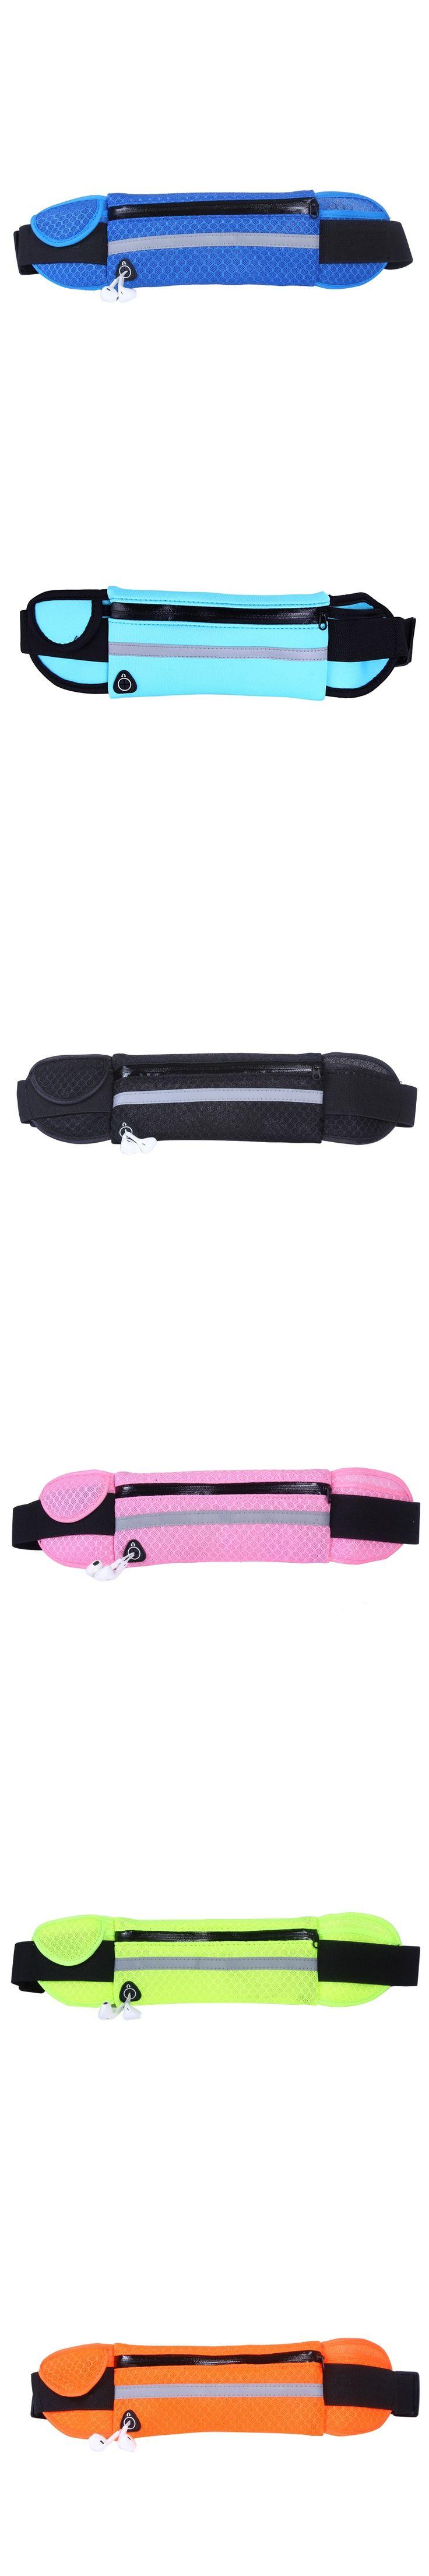 Man Women Waist Running bag Small Sport bag with earphone slot waterproof breathable small run bag  free shipping